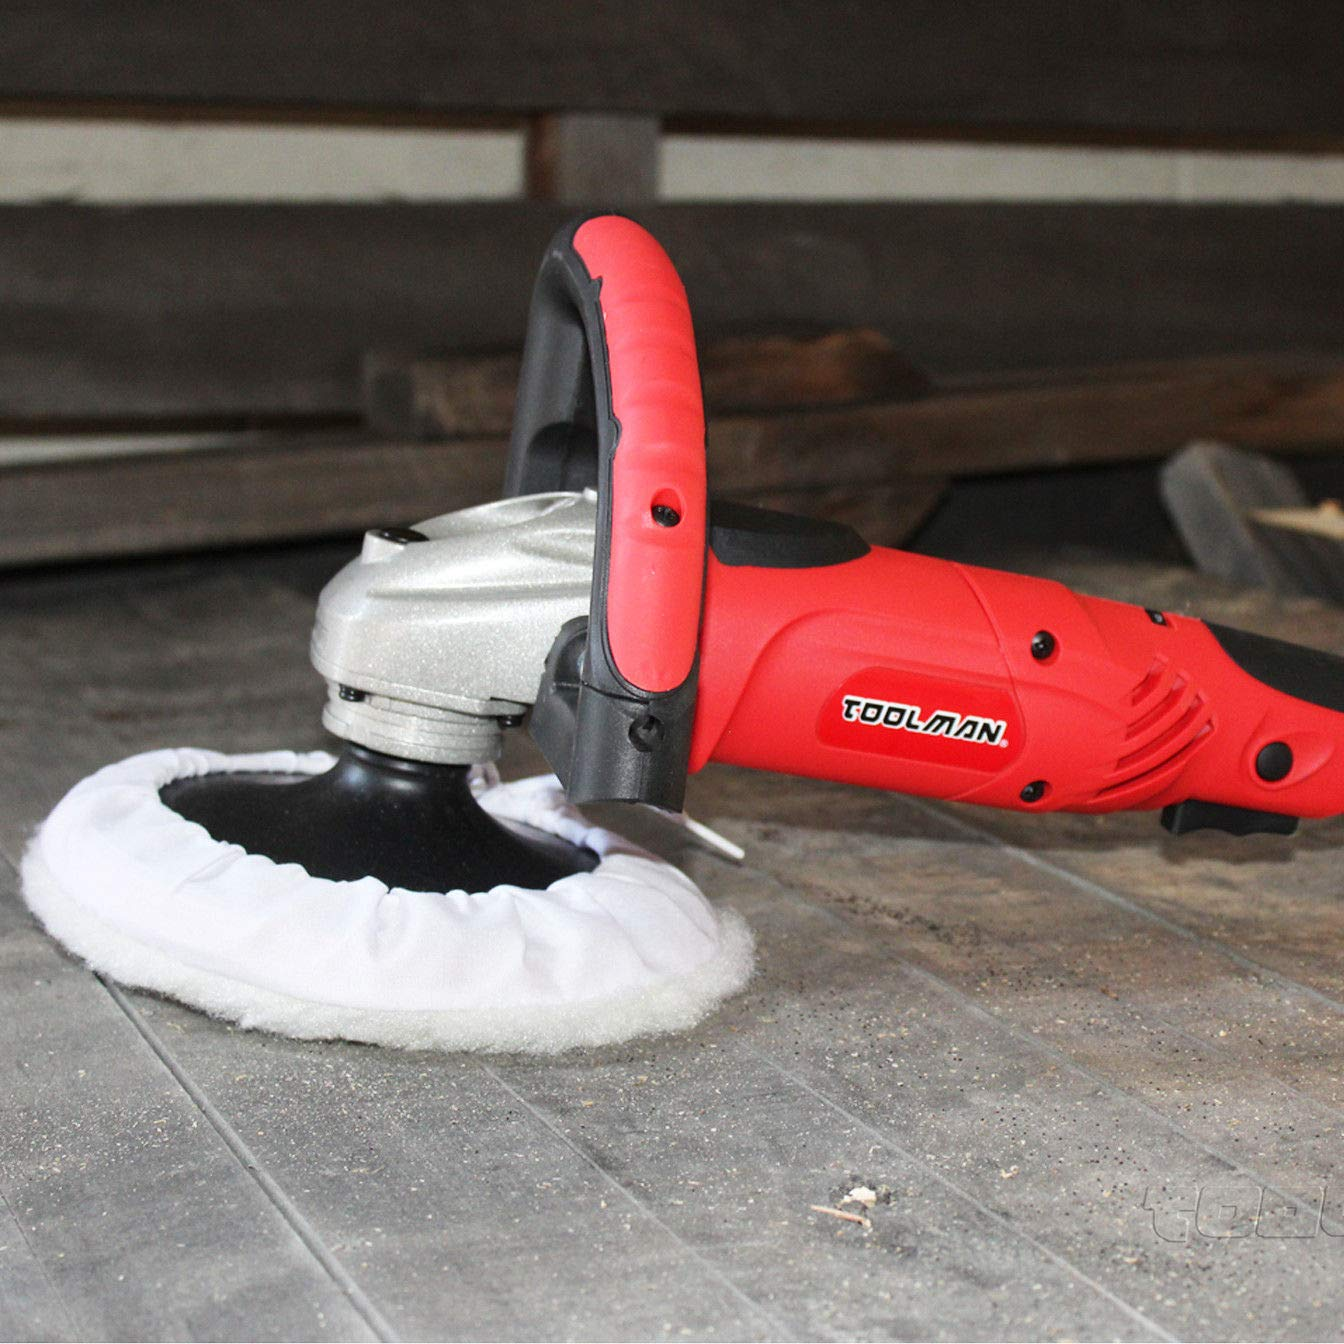 Toolman Compact Polishing Buffer Waxer Sander Machine 7'' W/ Wool pad & sandpaper works with DeWalt Makita Ryobi by TOOLSMAN (Image #3)